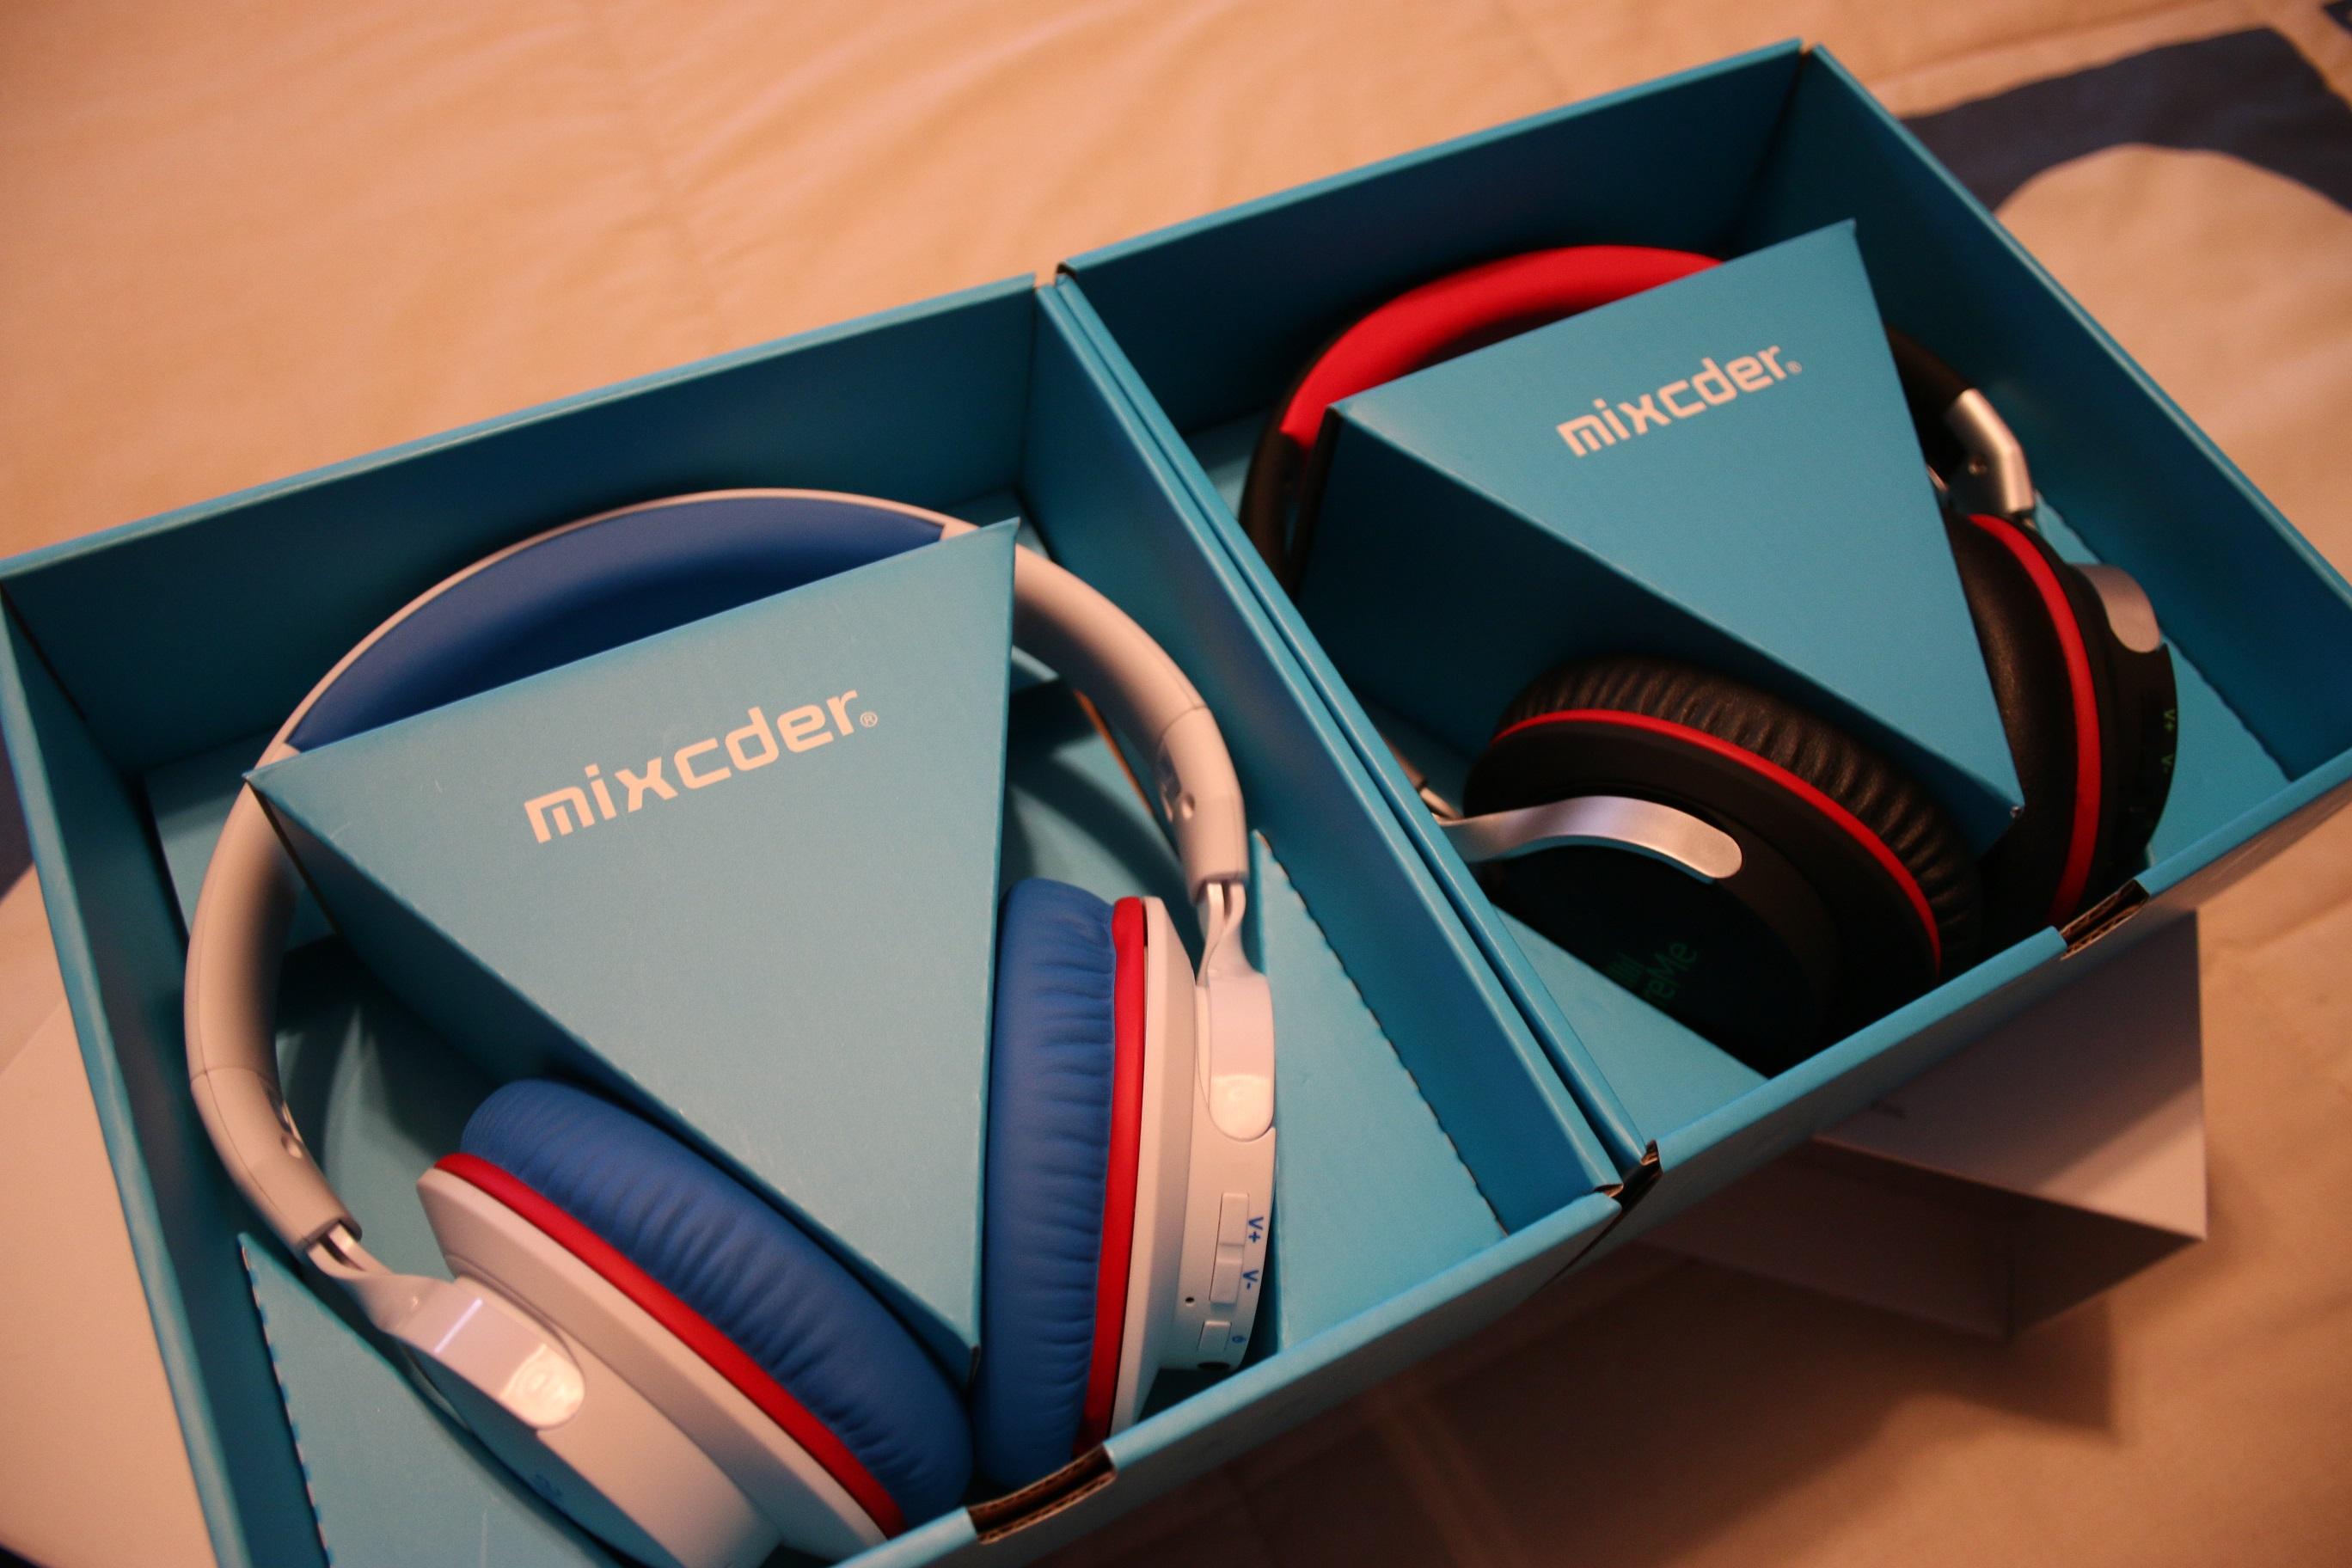 Ve con estilo con los cascos Mixcder ShareMe Wireless Bluetooth